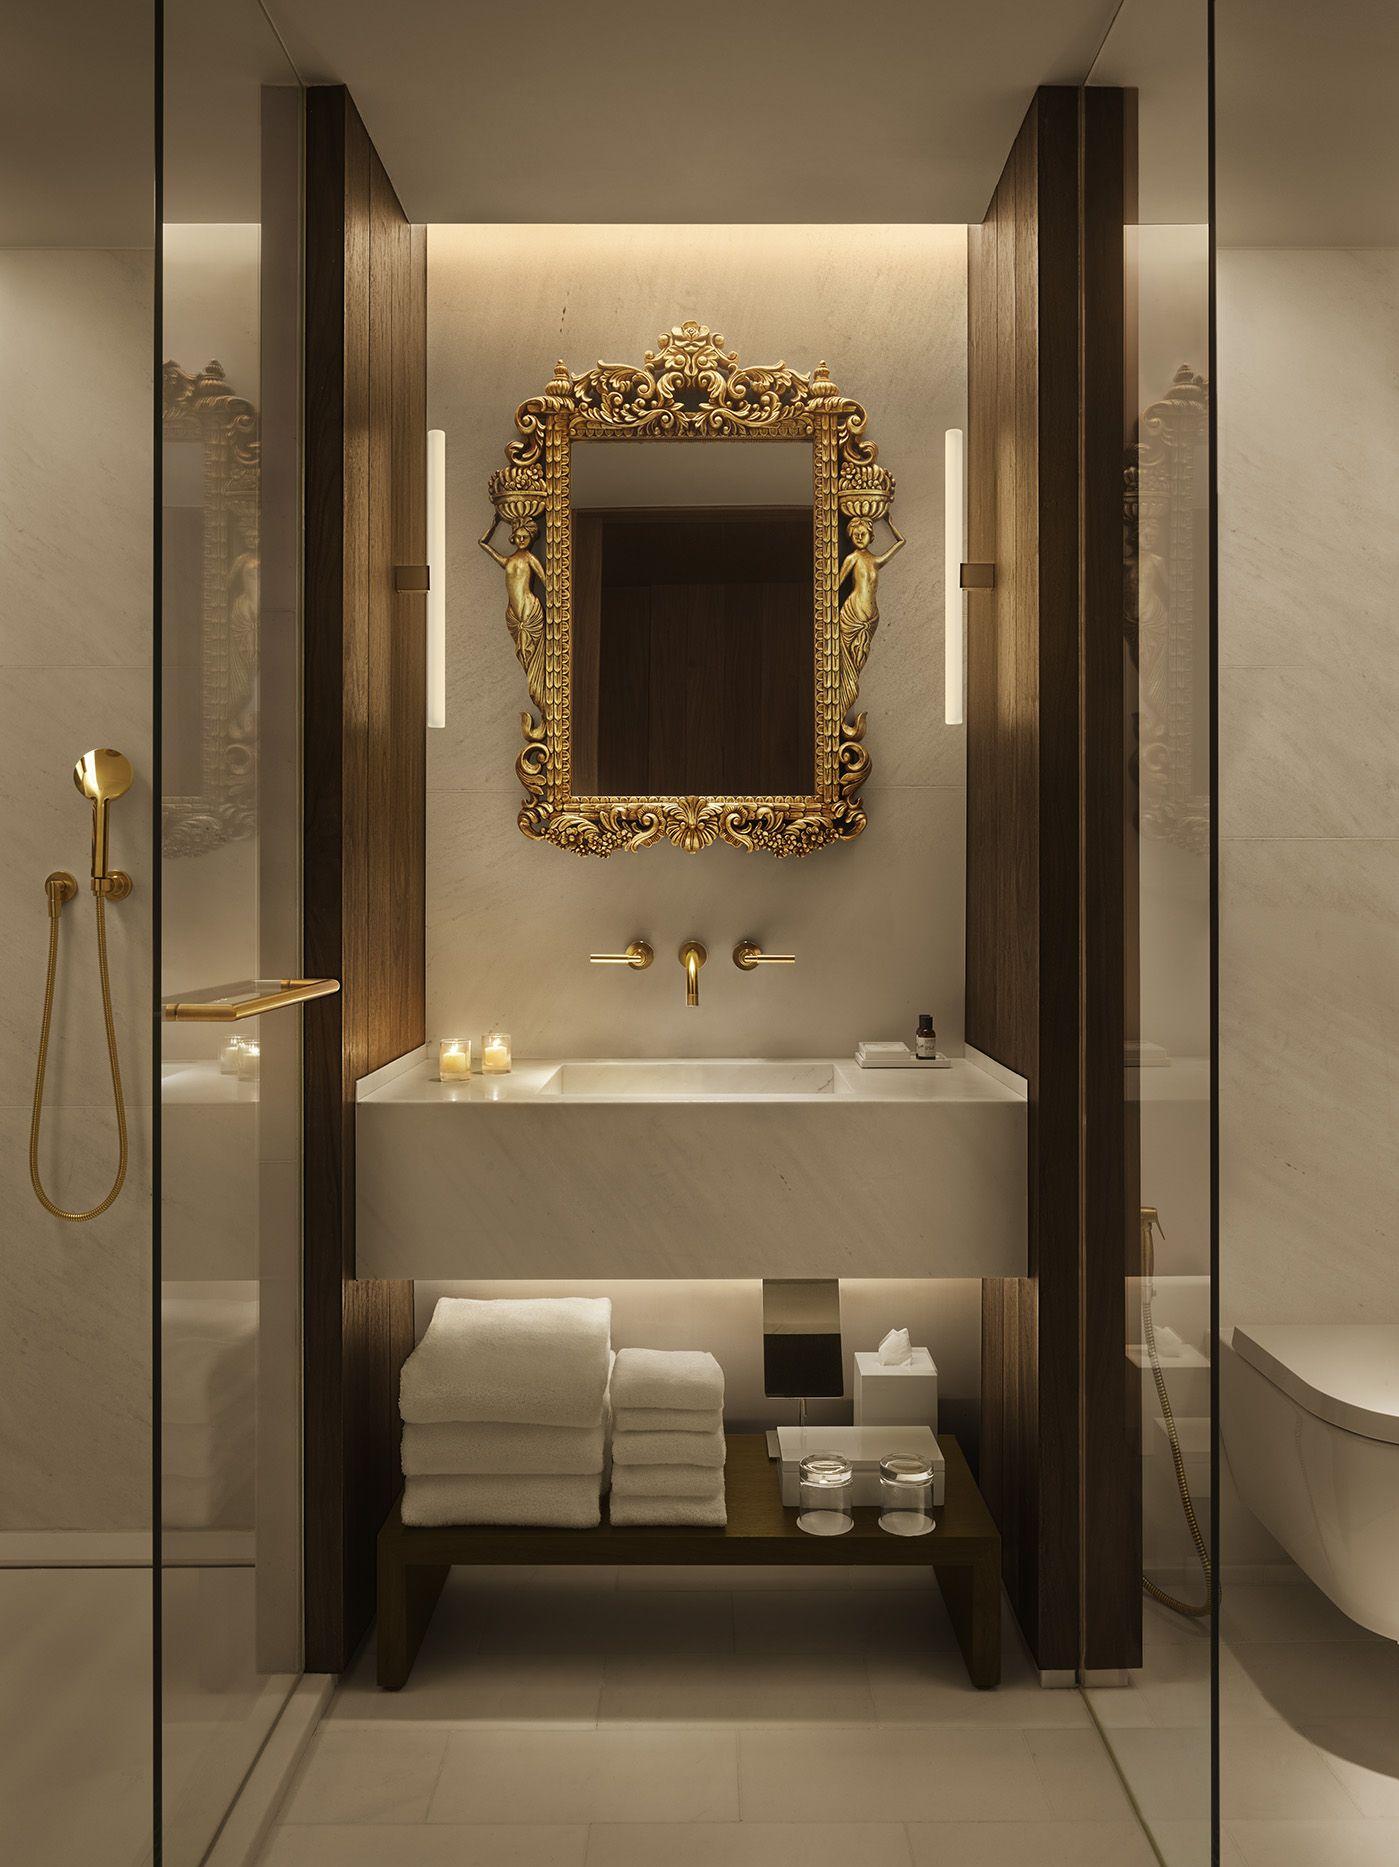 Bathroom  Edition hotel, Luxury bathroom master baths, Bathroom